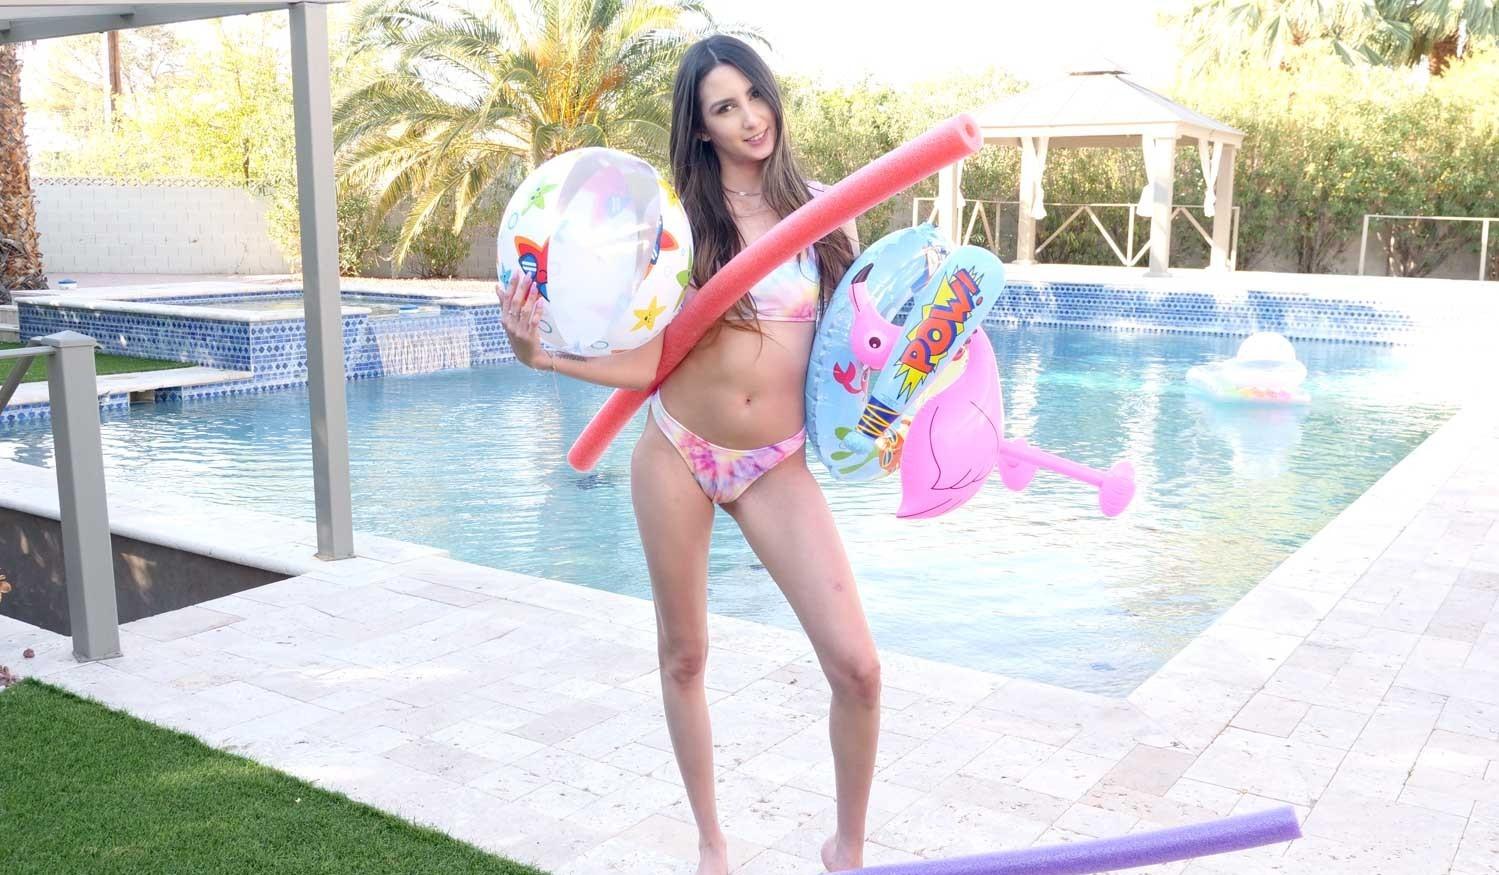 Natalia Nix by the pool